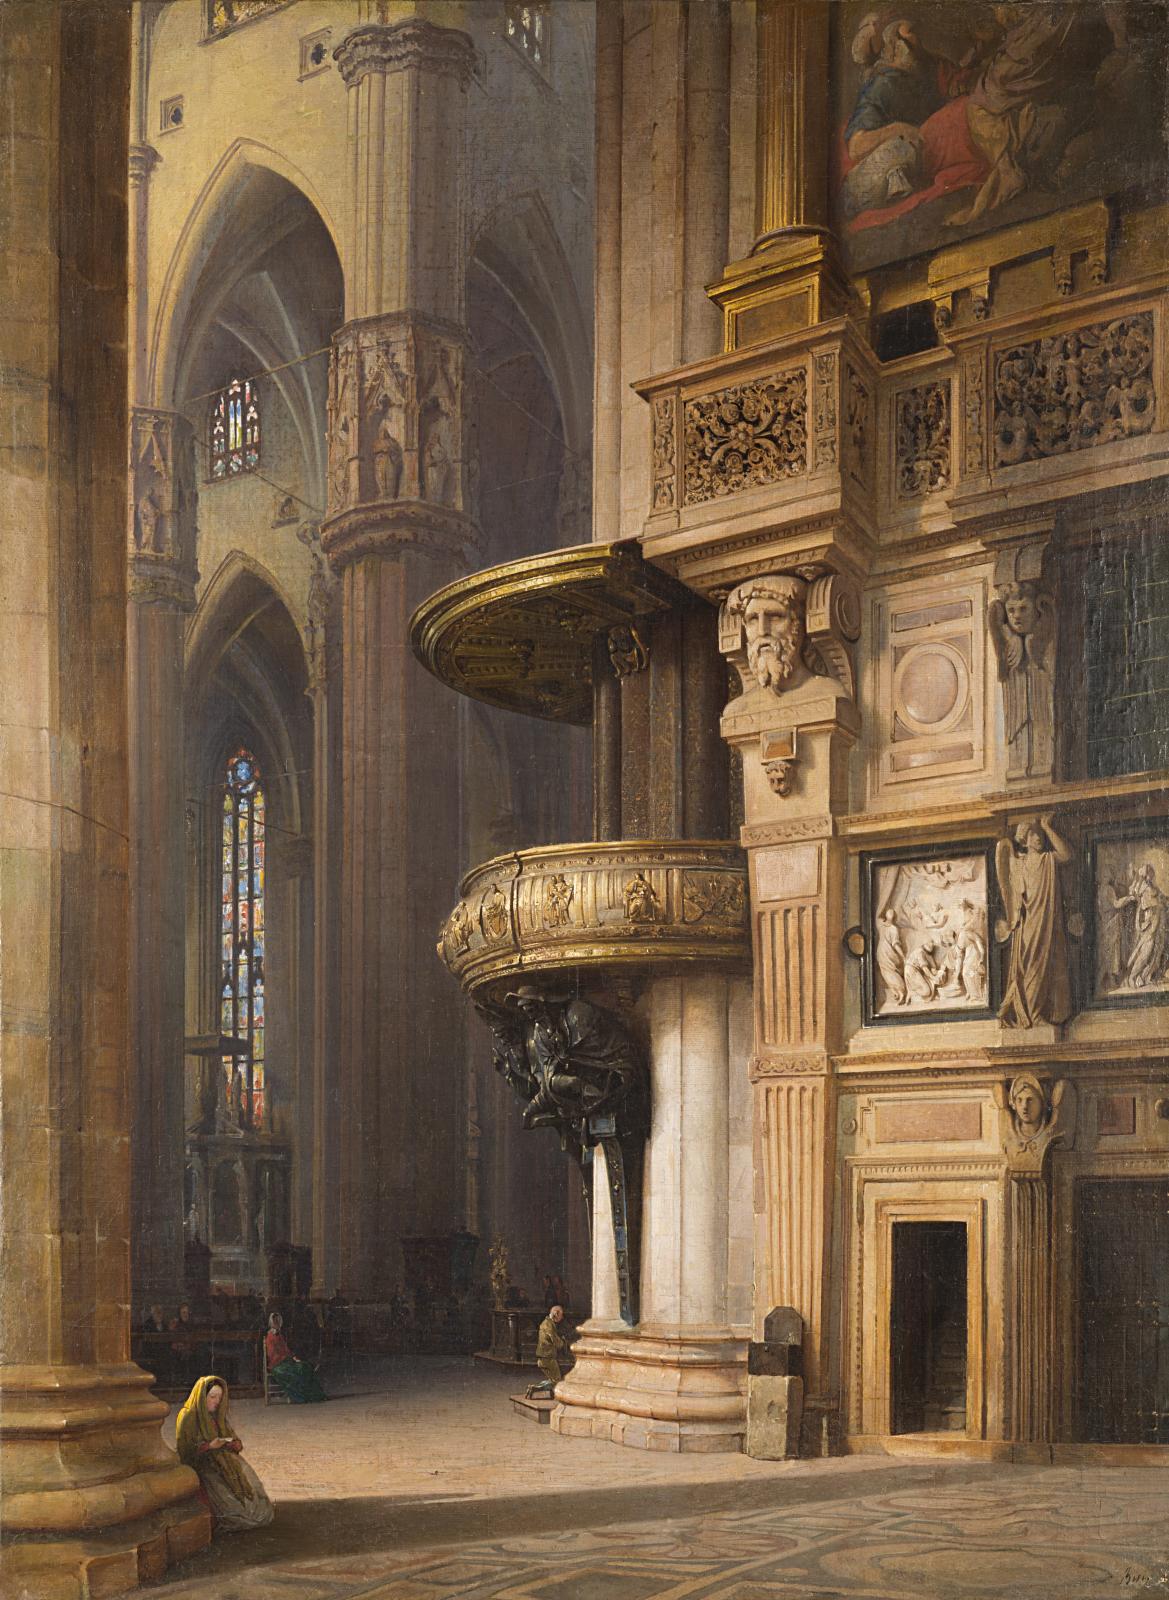 Luigi Bisi, Interno del Duomo di Milano (1859; olio su tela, 109,9 x 83,2 cm; Milano, Galleria d'Arte Moderna)